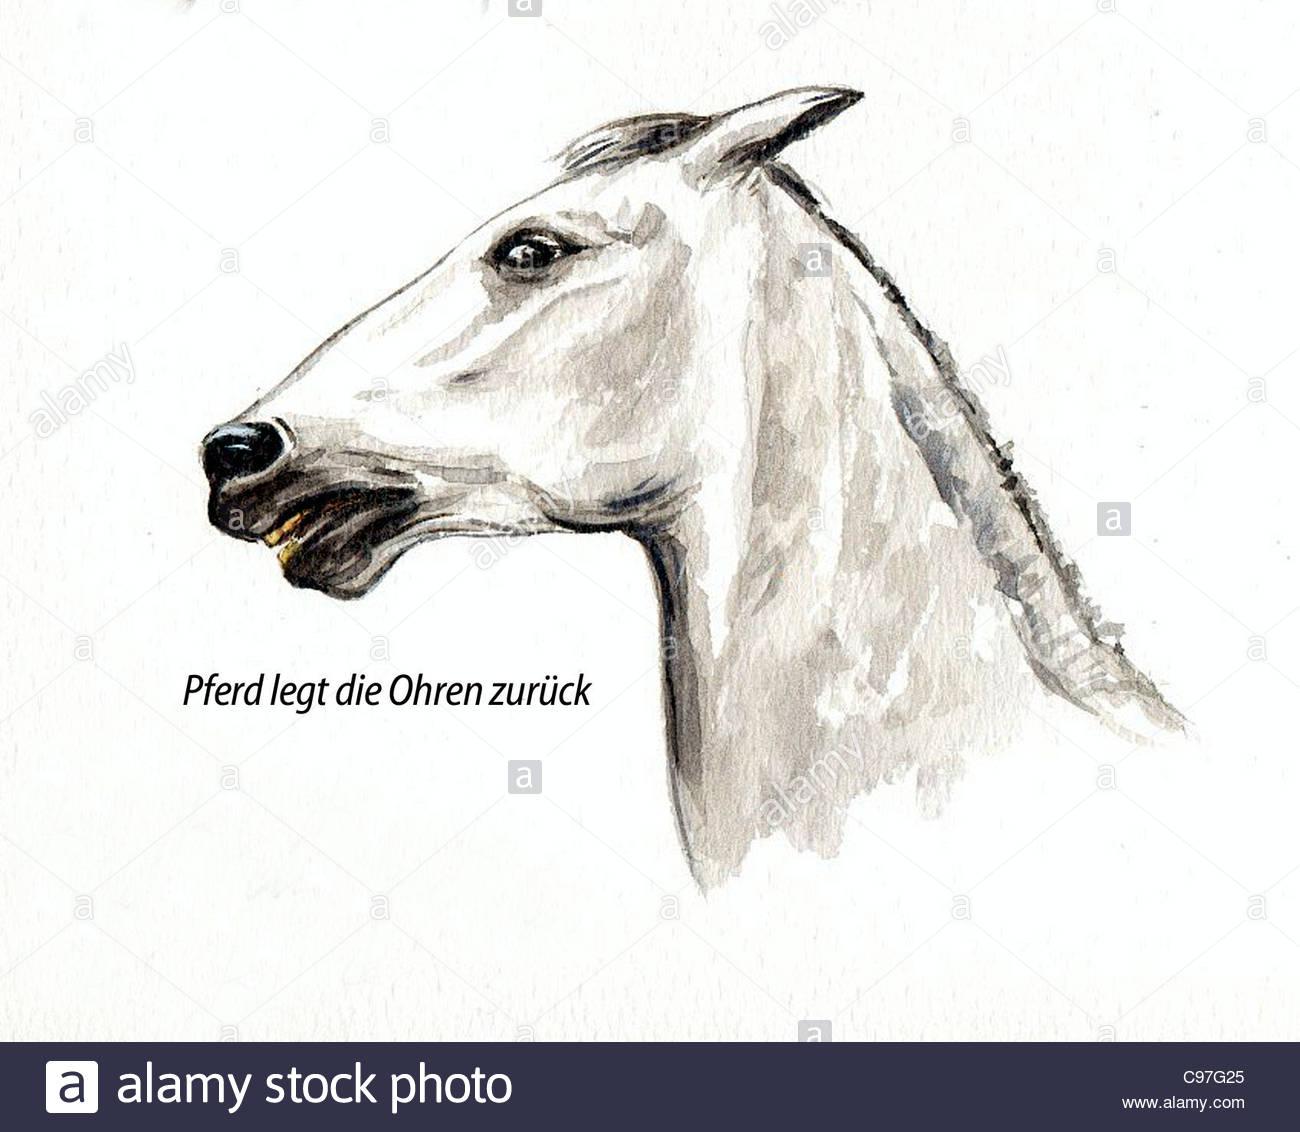 Anatomy Horse Animal Illustration Stock Photos & Anatomy Horse ...